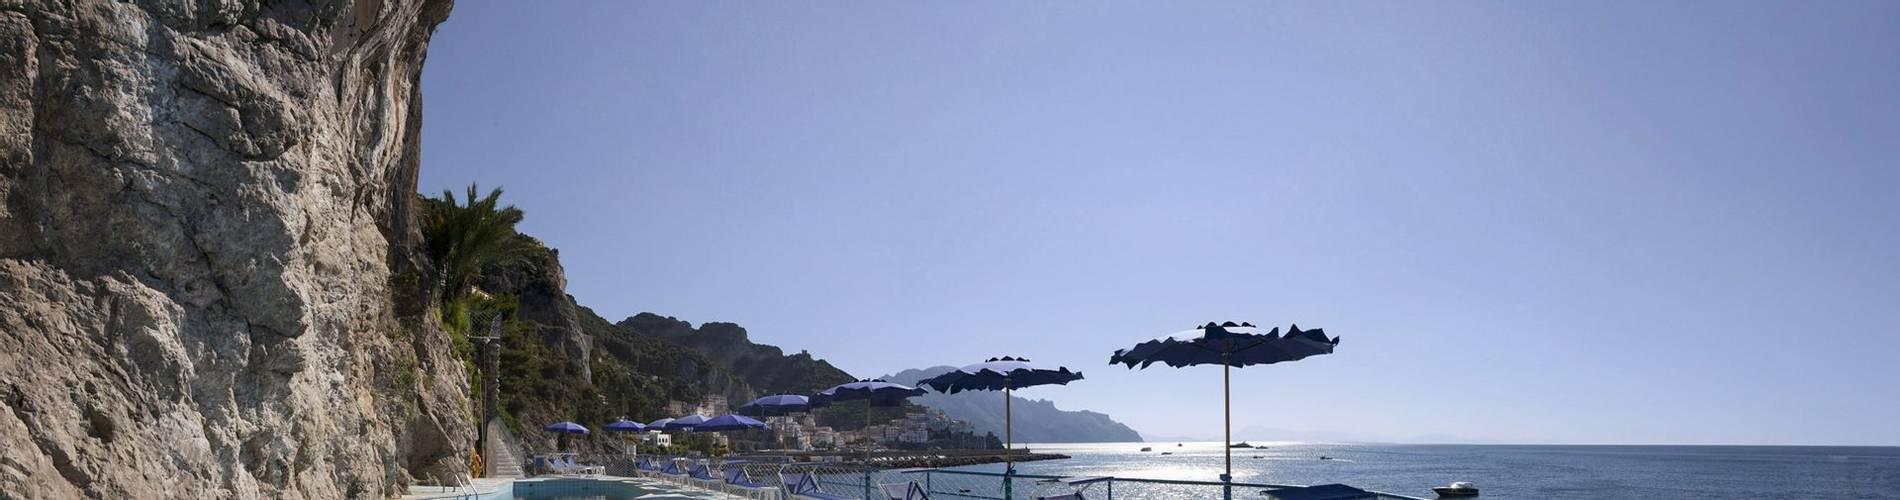 Miramalfi, Amalfi Coast, Italy (37).jpg